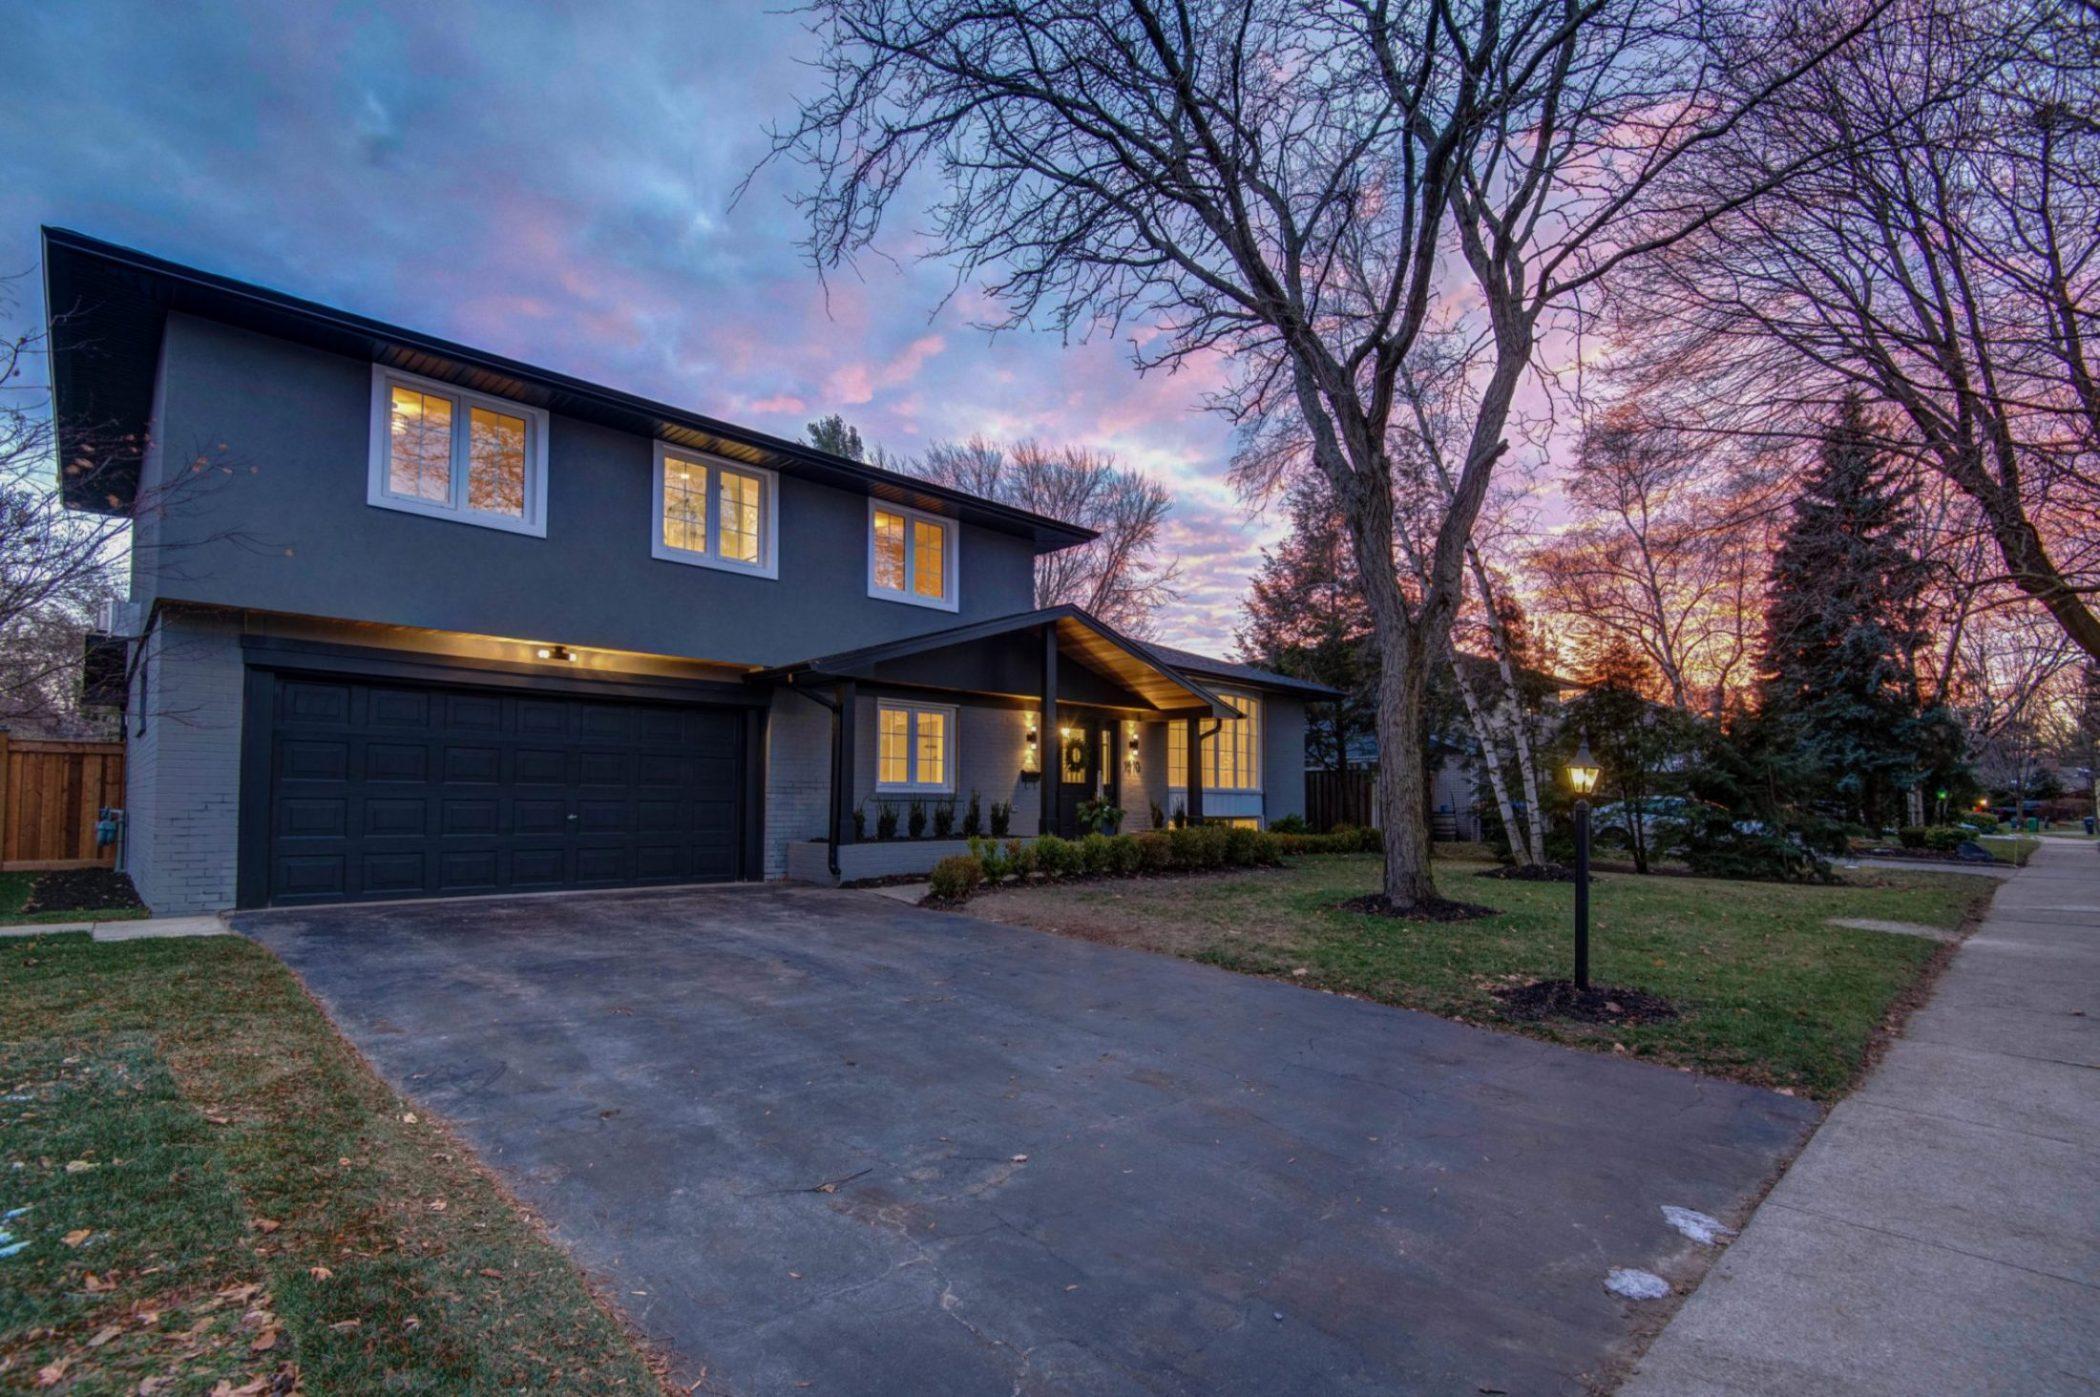 Toronto GTA Sunset Exterior Real Estate | Sam Gaetz Photography